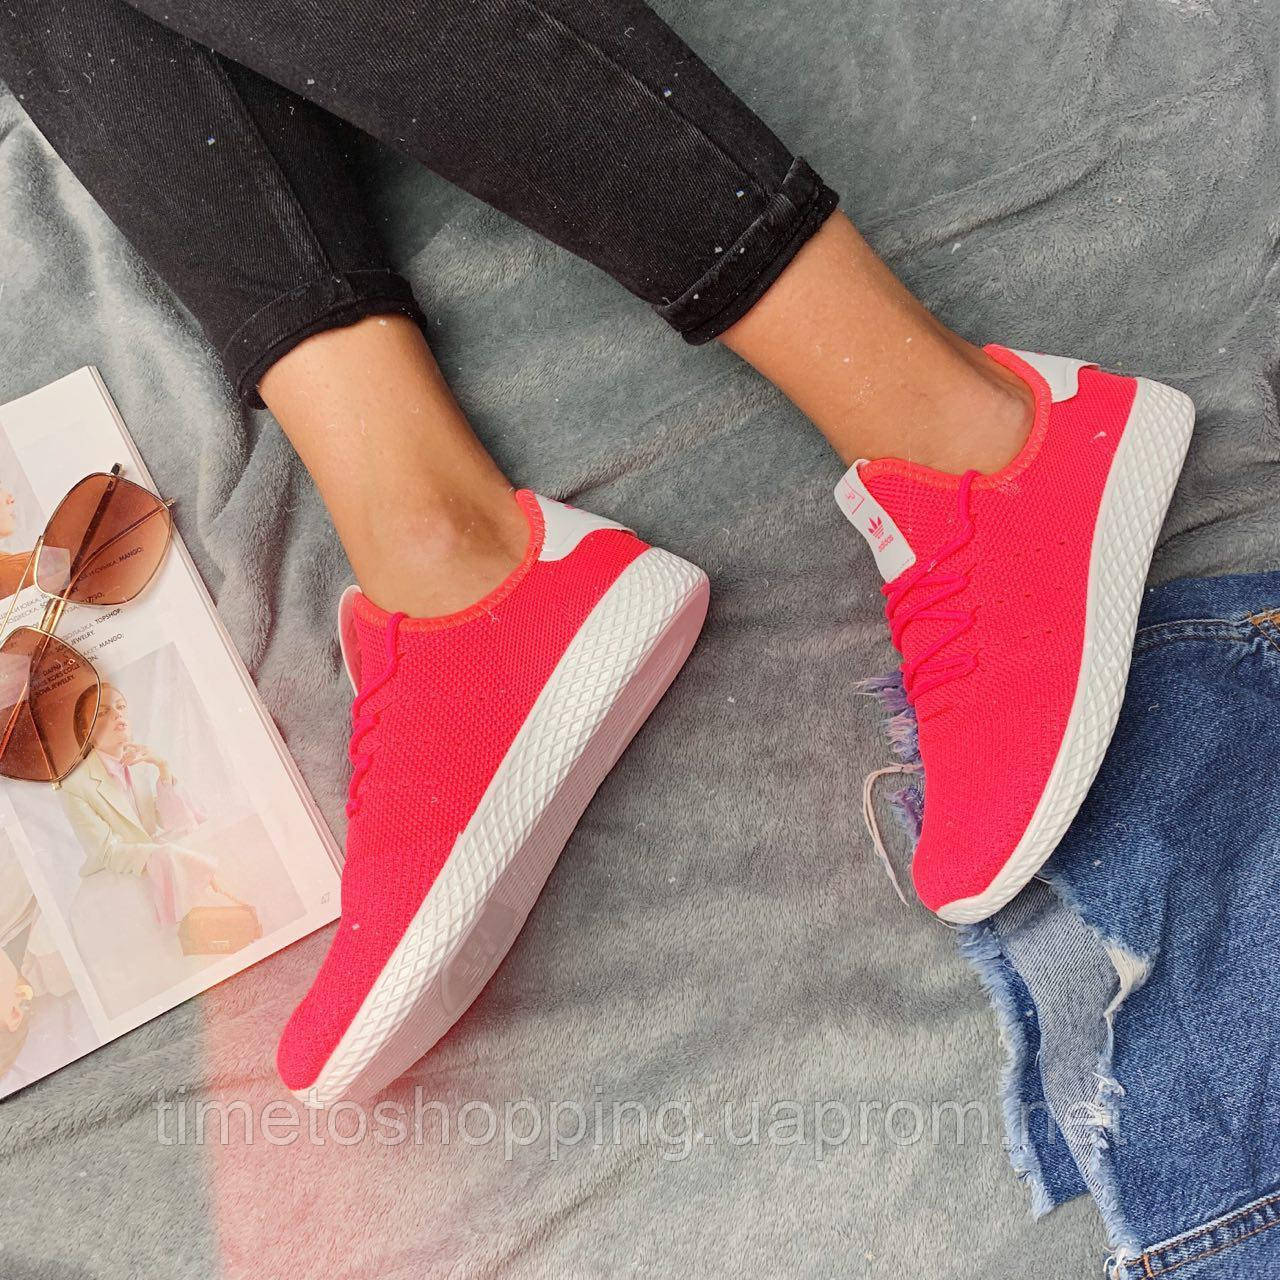 Кроссовки женские Adidas Pharrell Williams  30776 ⏩ [РАЗМЕР 38 ]